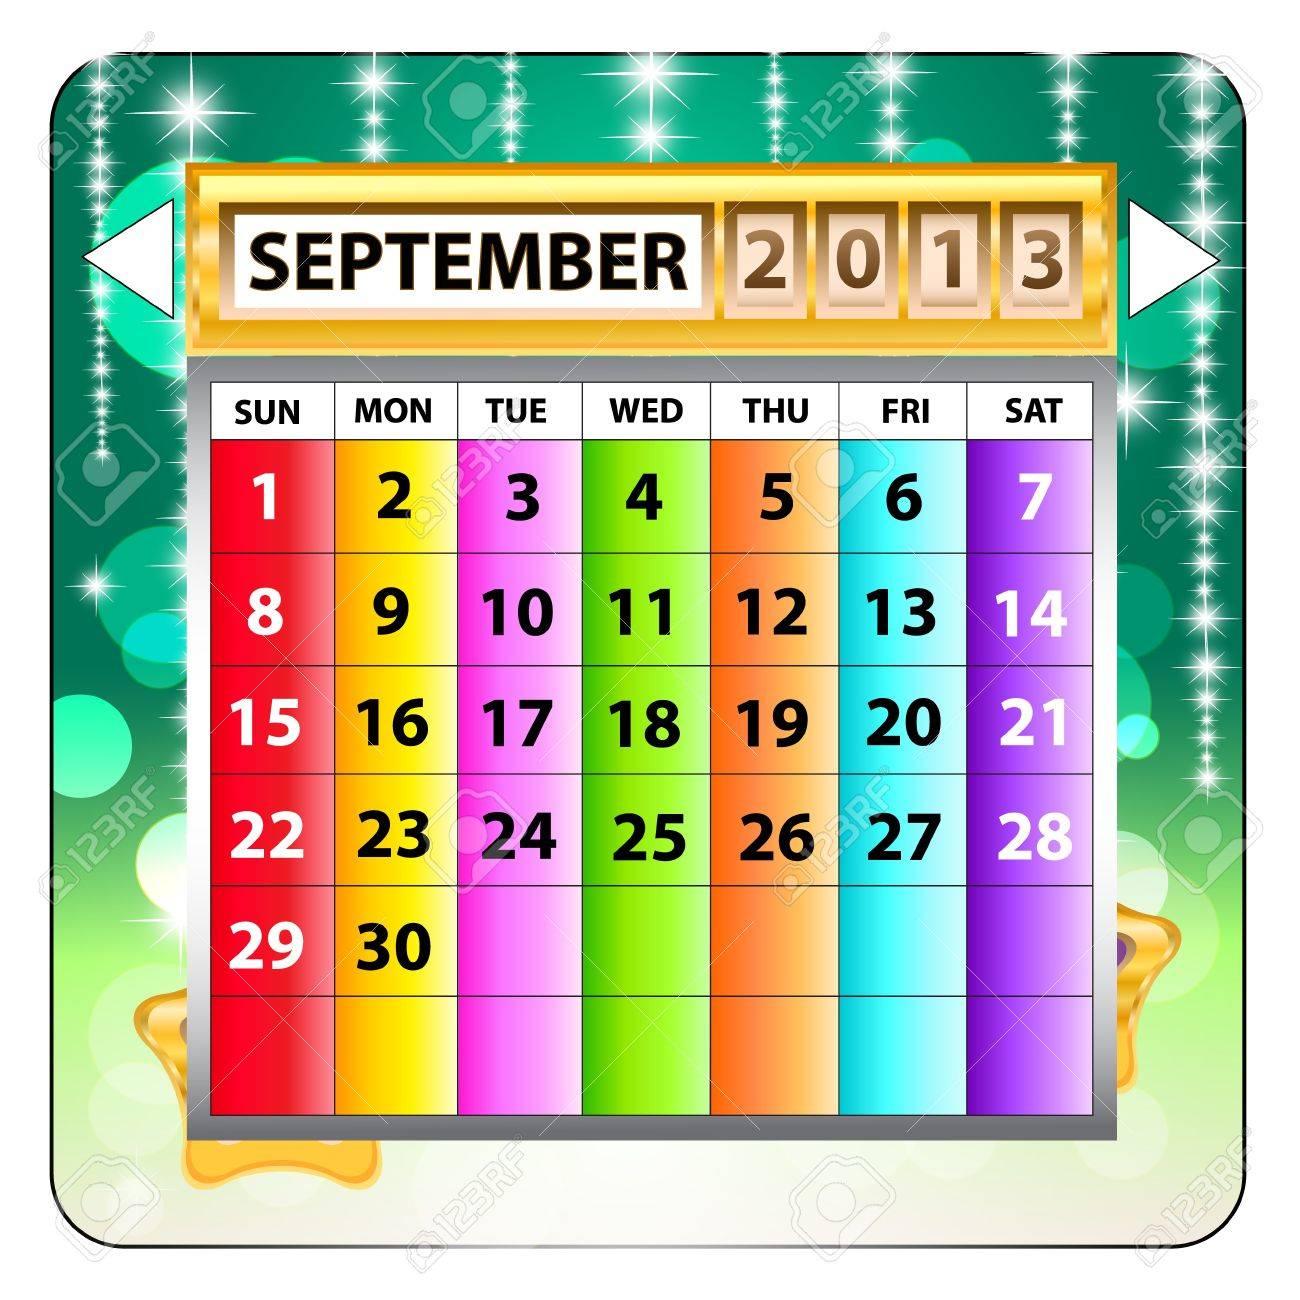 September 2013 calendar  Happy new year Stock Vector - 15143289